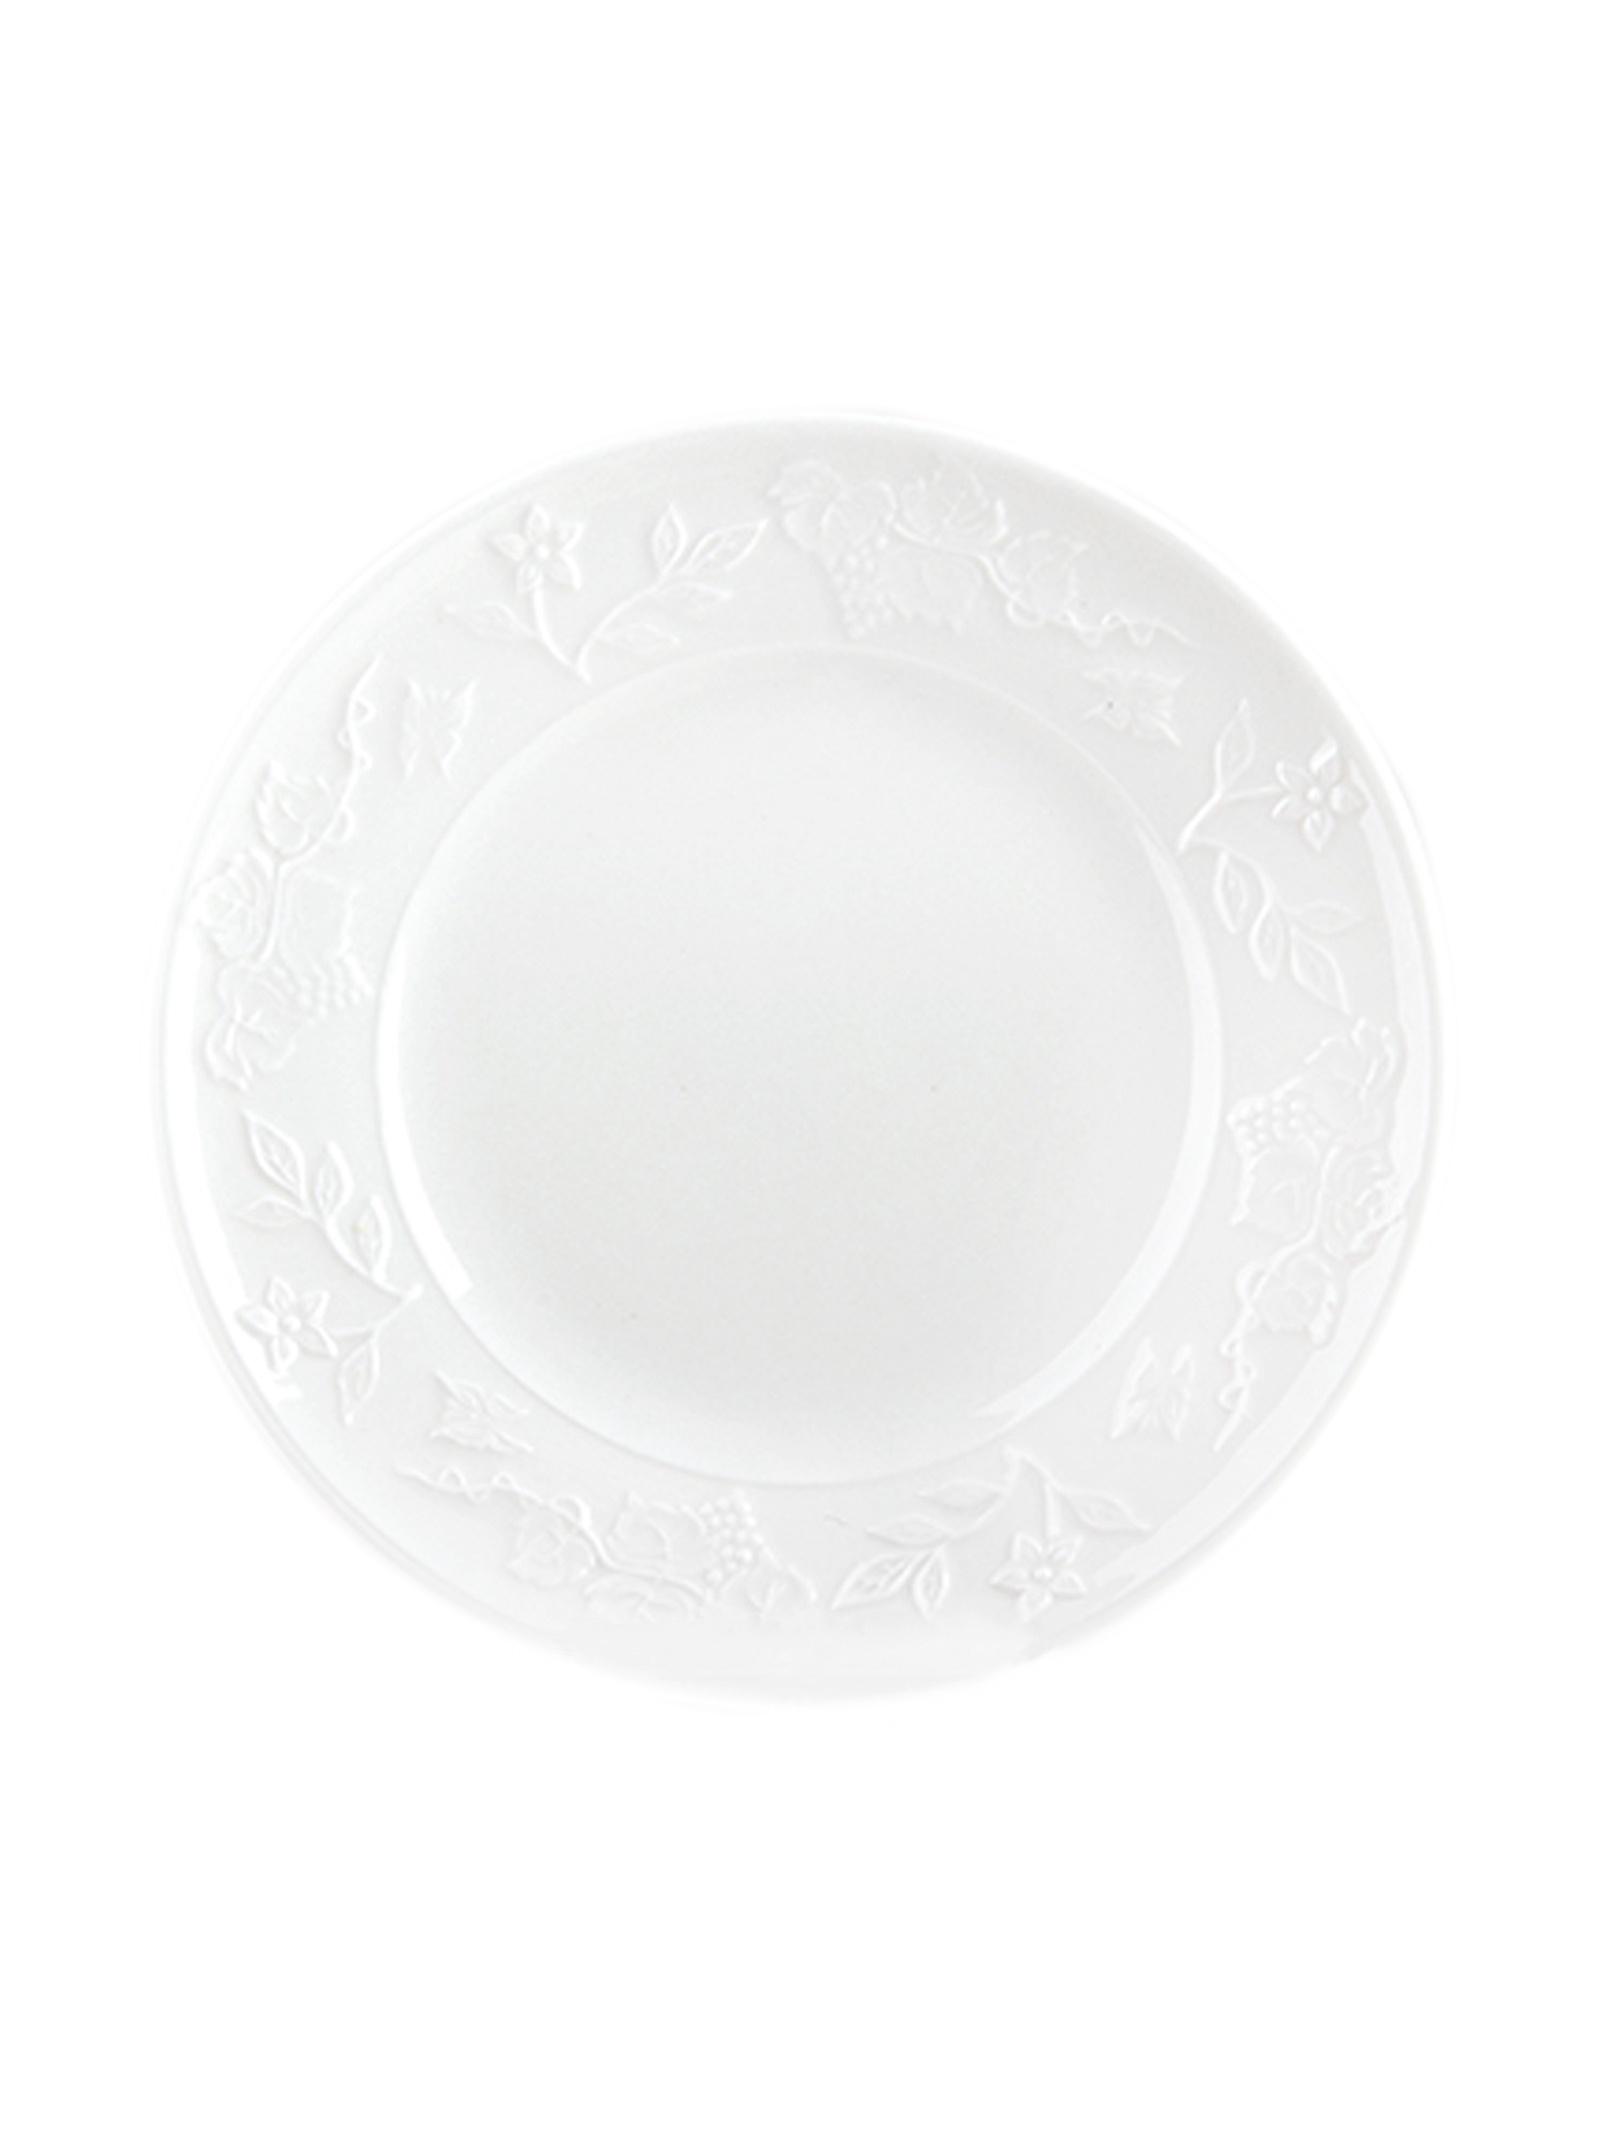 Тарелка десертная Коралл 930616, Керамика тарелка десертная ломоносовская керамика диаметр 21 см